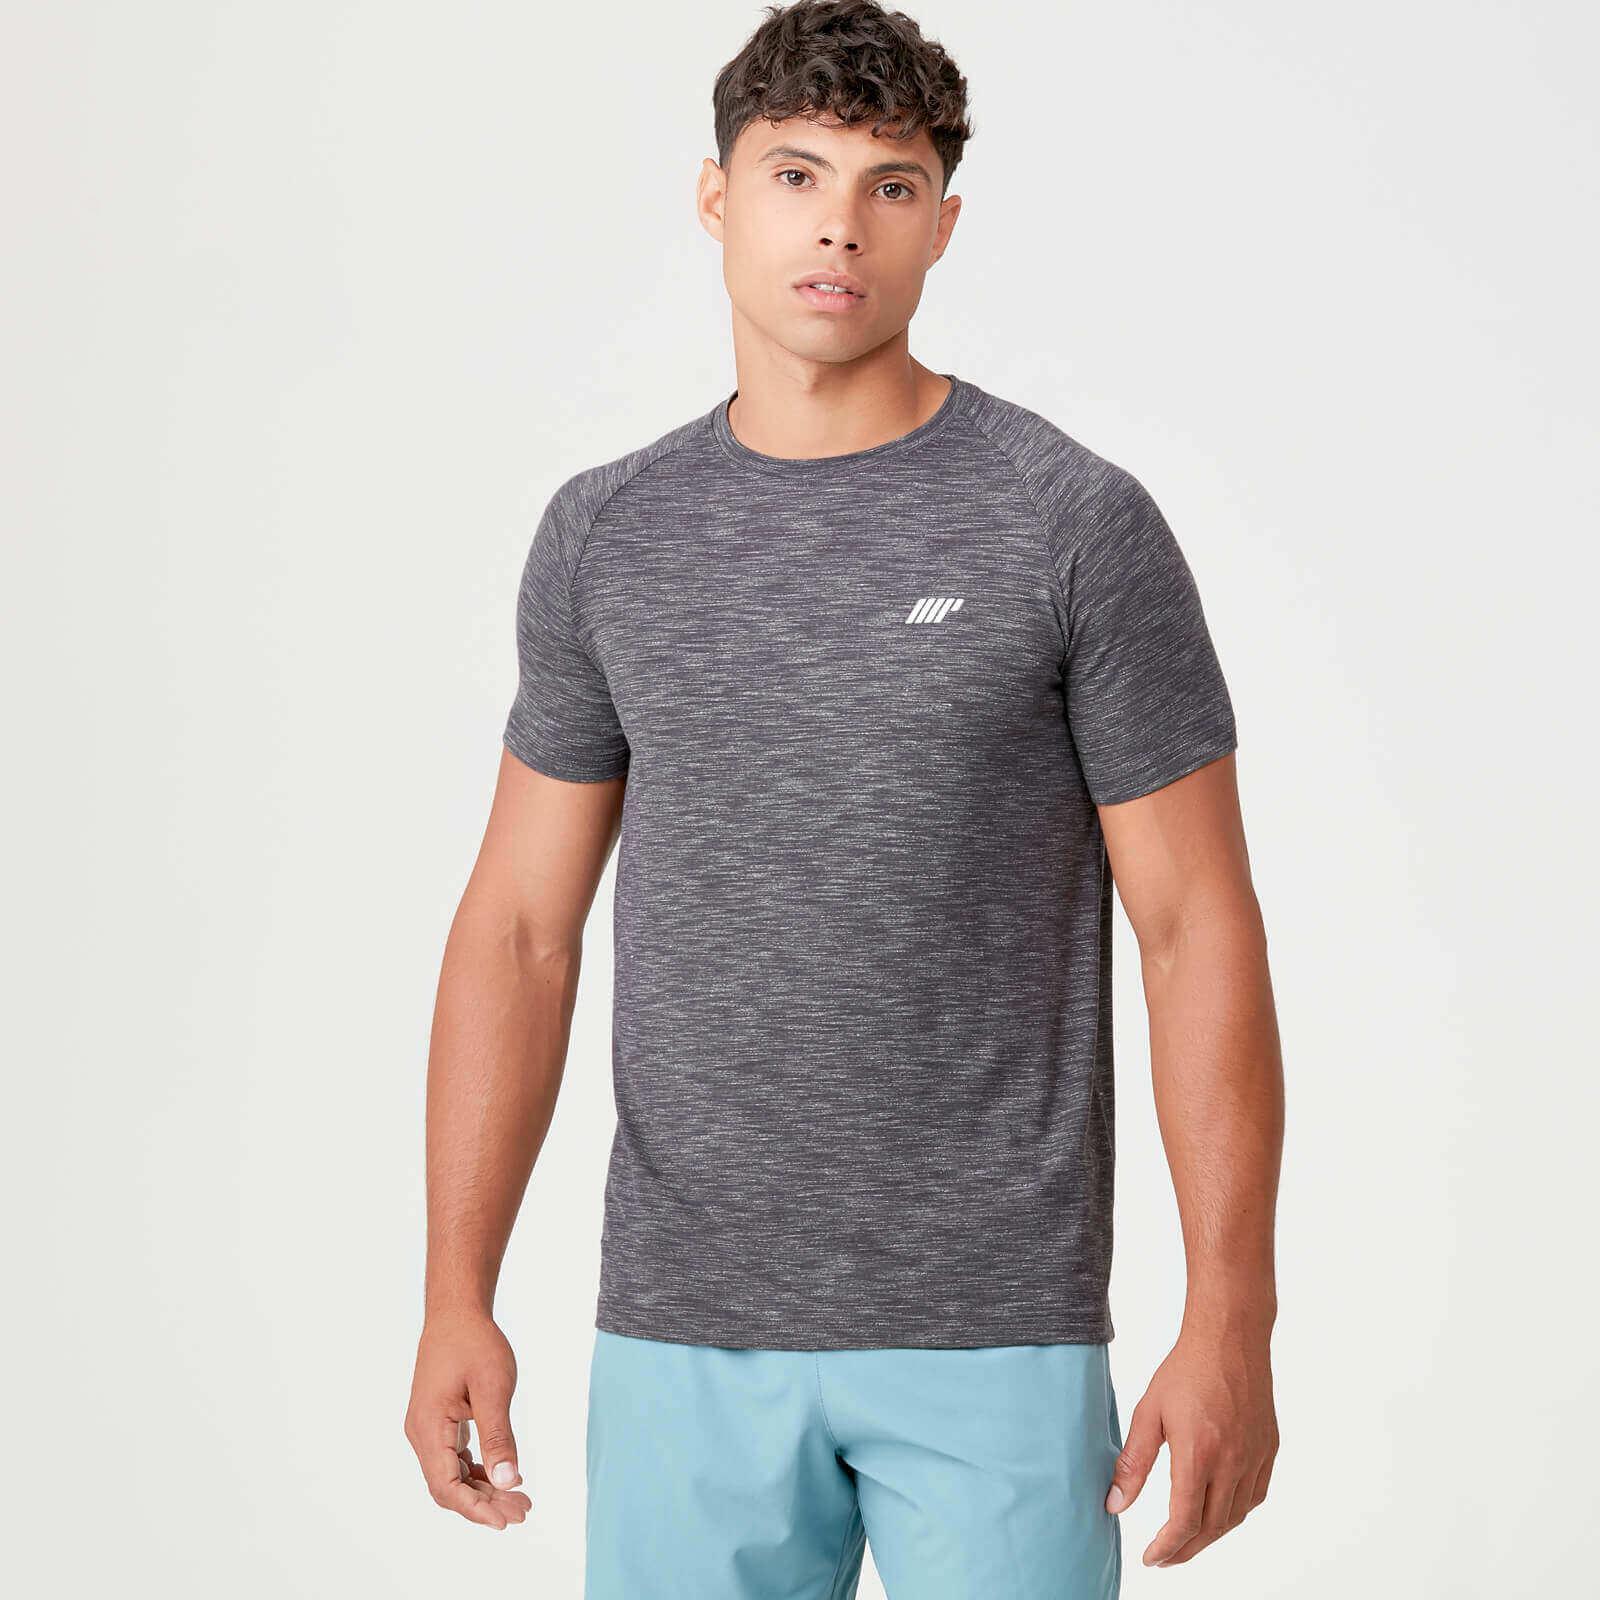 Myprotein Performance T-Shirt - Charcoal Marl - XXL